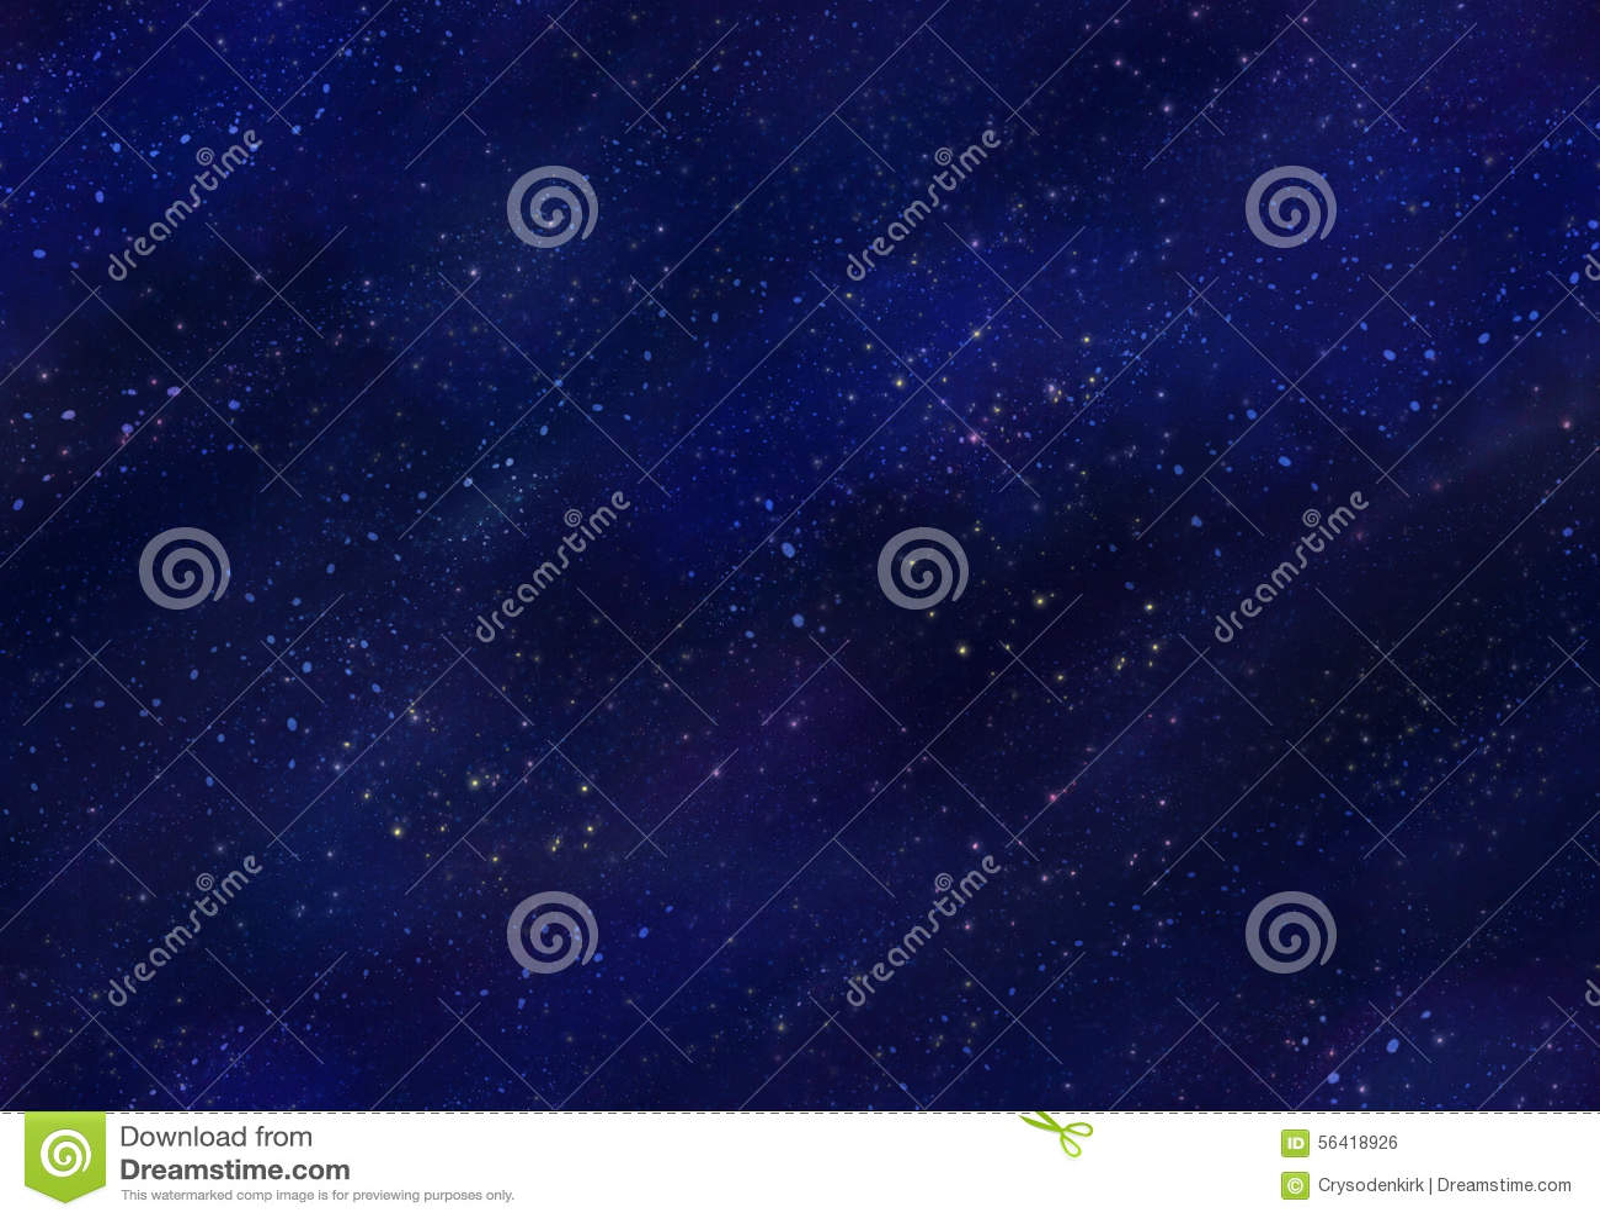 Starfield Night Sky Seamless Tile